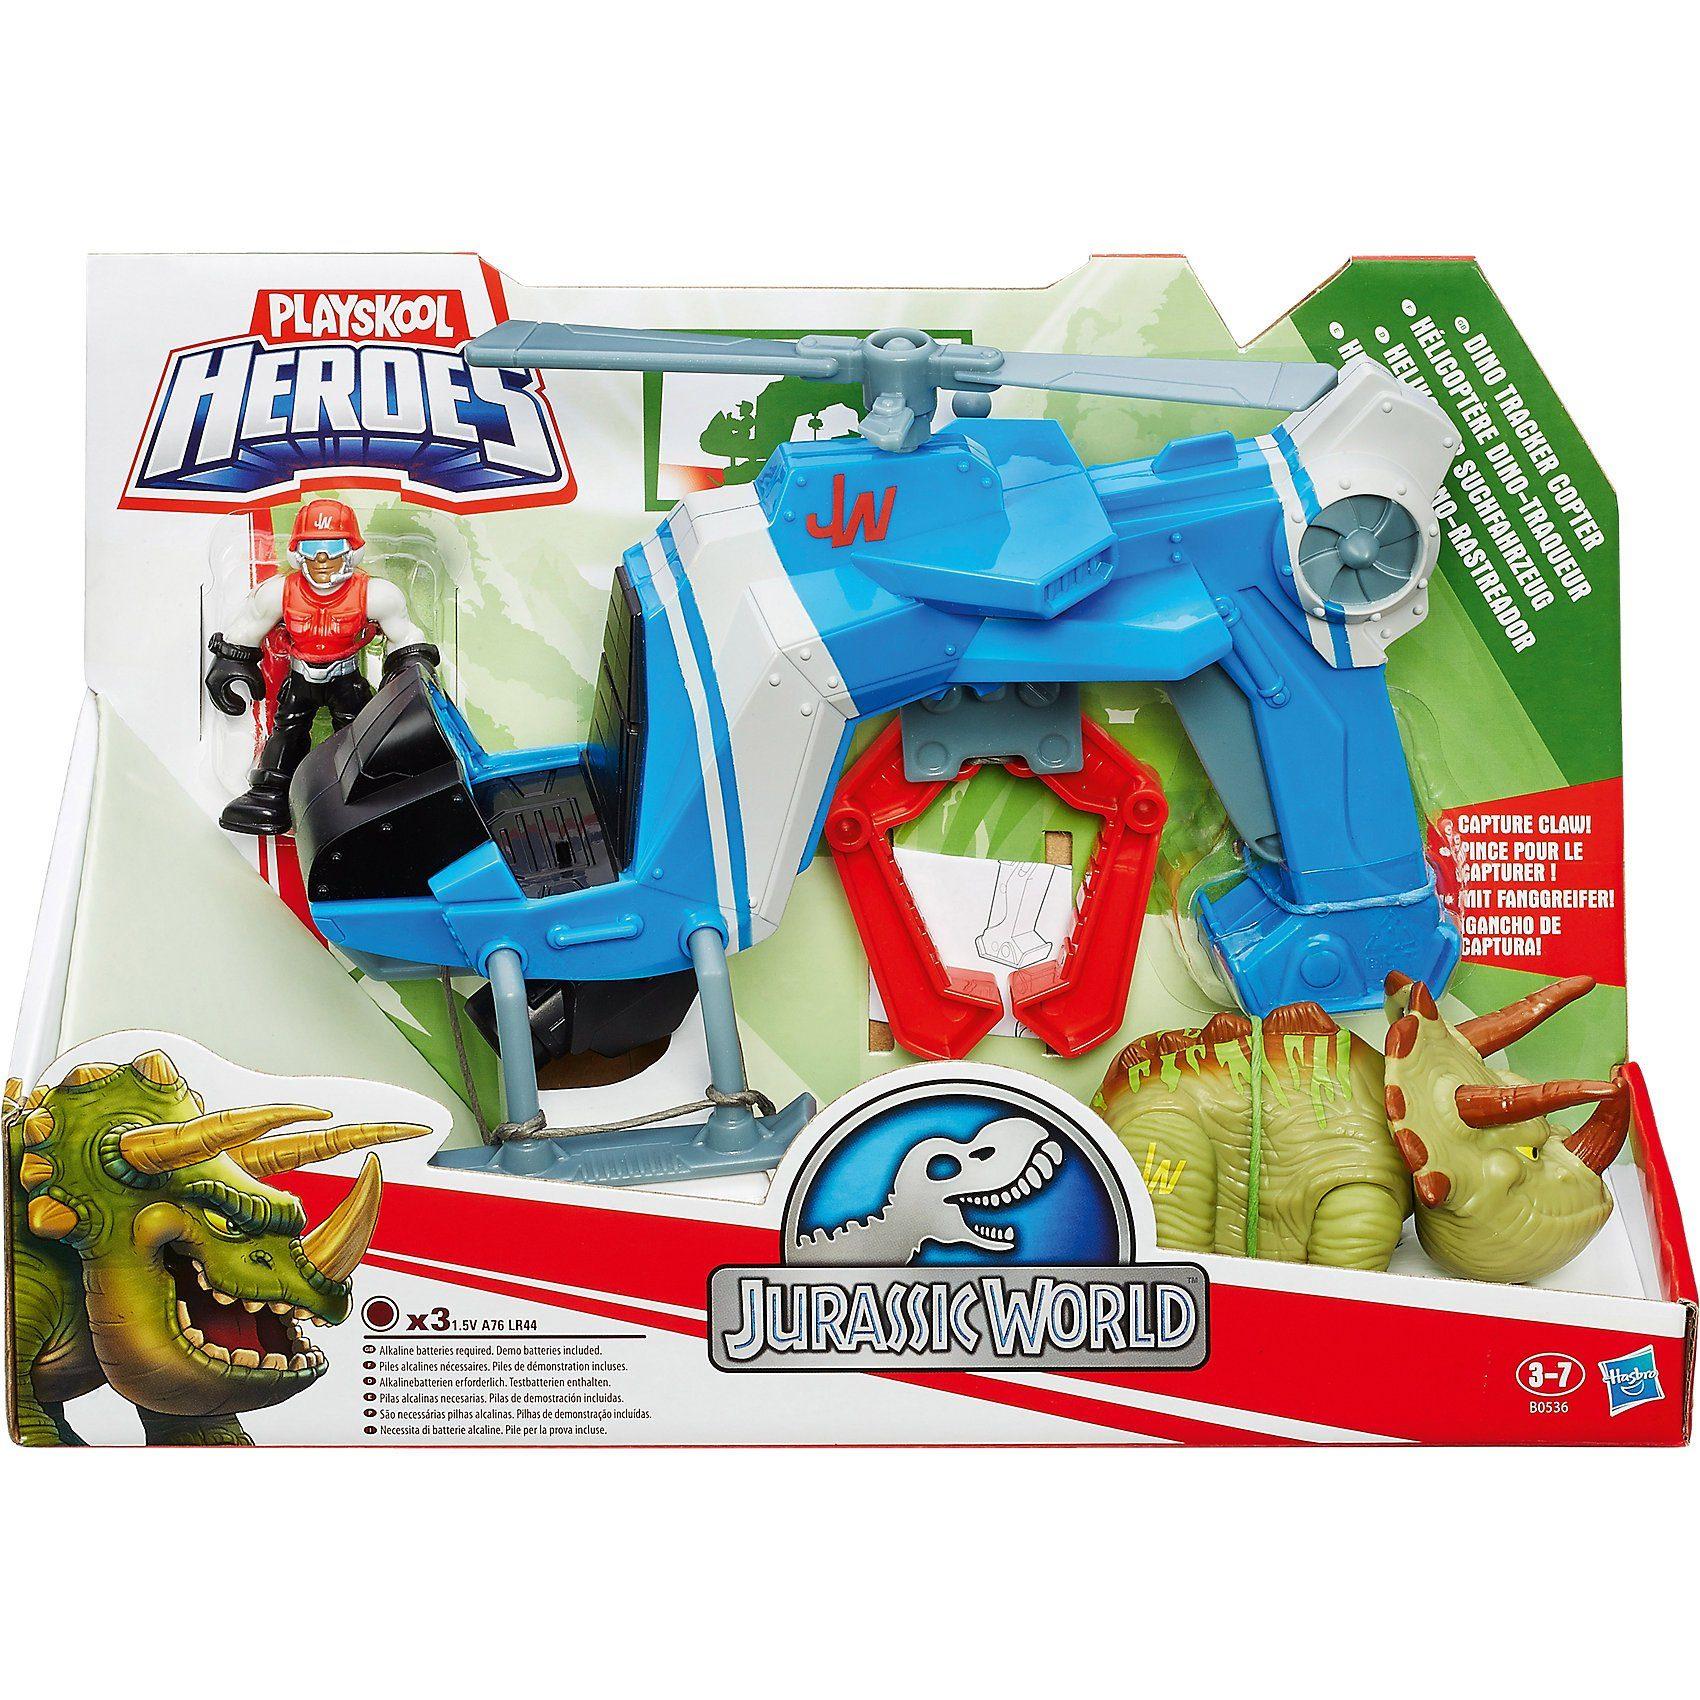 Hasbro Playskool - Jurassic World Suchfahrzeugset, 2-fach sortiert